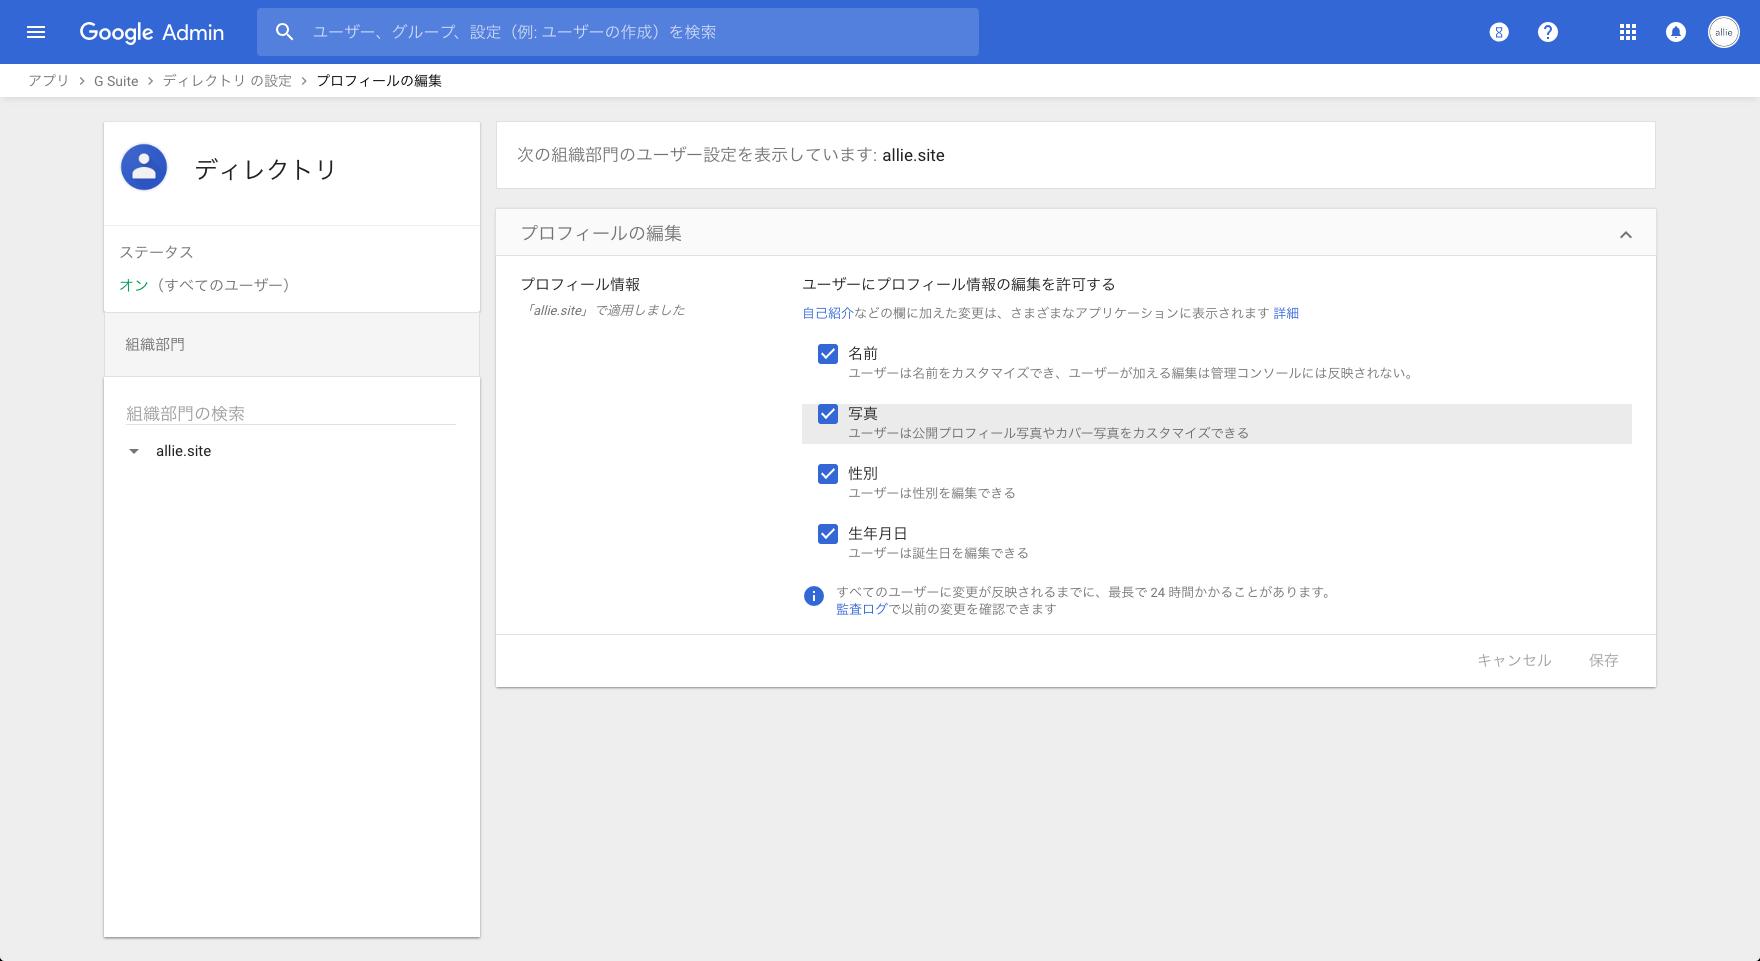 G Suite プロフィールアイコン画像設定画面